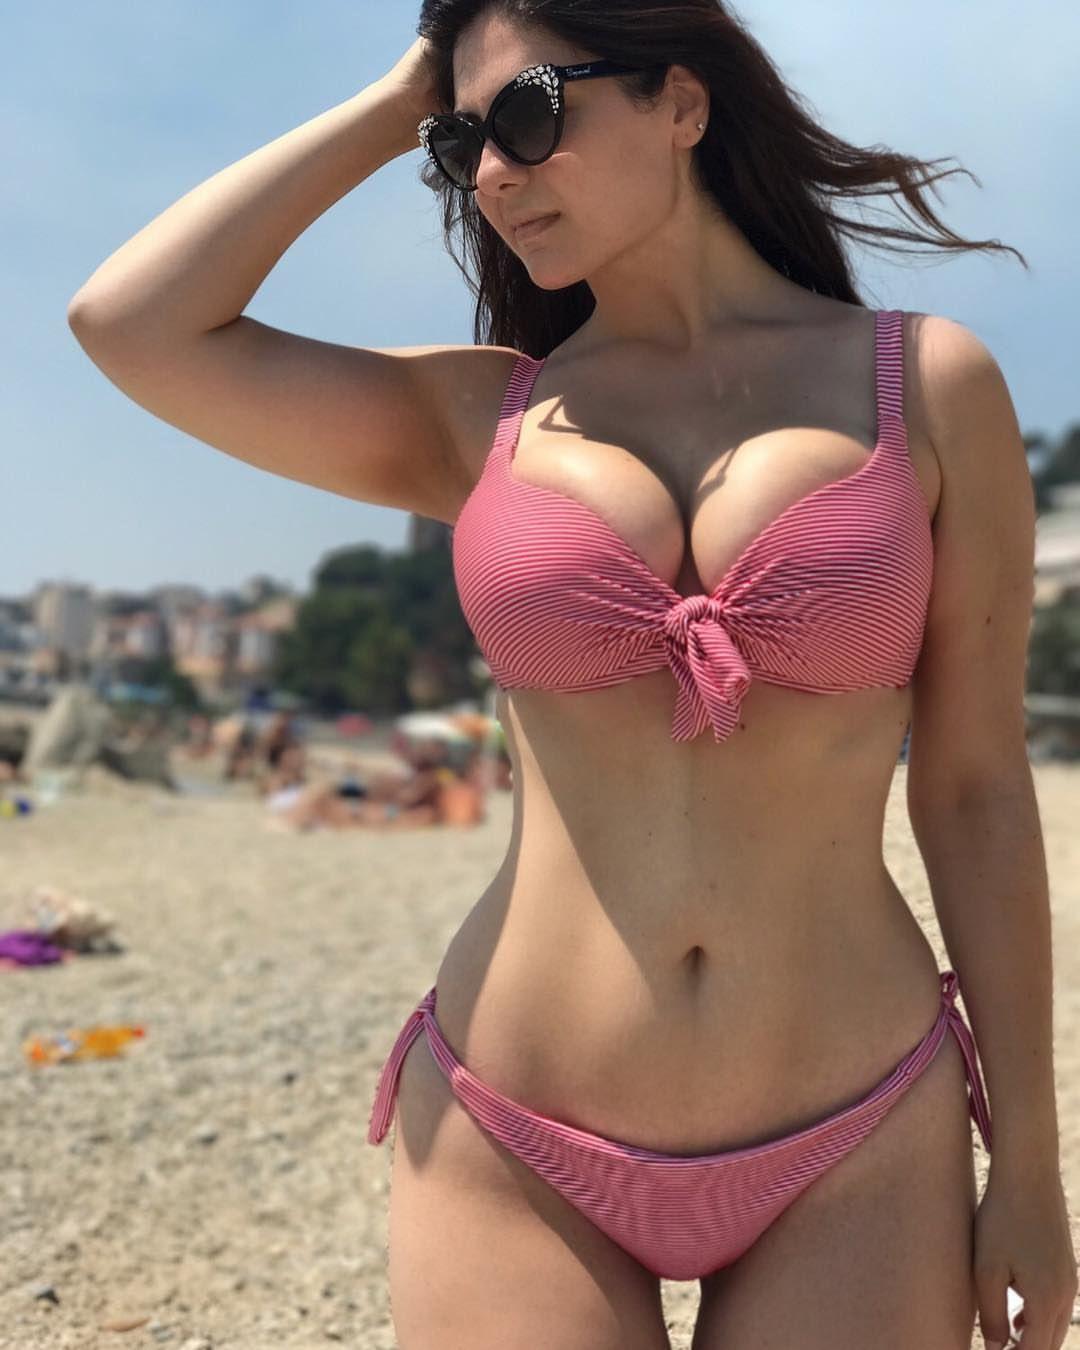 9c31d53e6cc566 Paola Torrente   paola in 2019   Hot bikini, Bikinis, Bikini babes